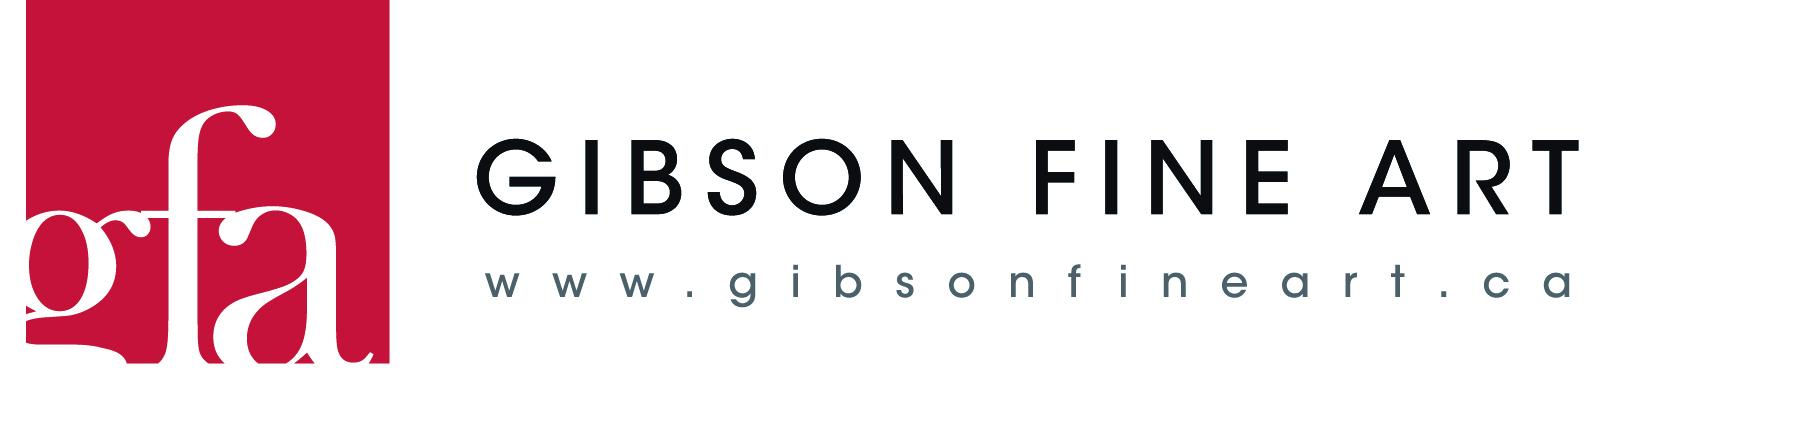 Gibson Fine Art Logo